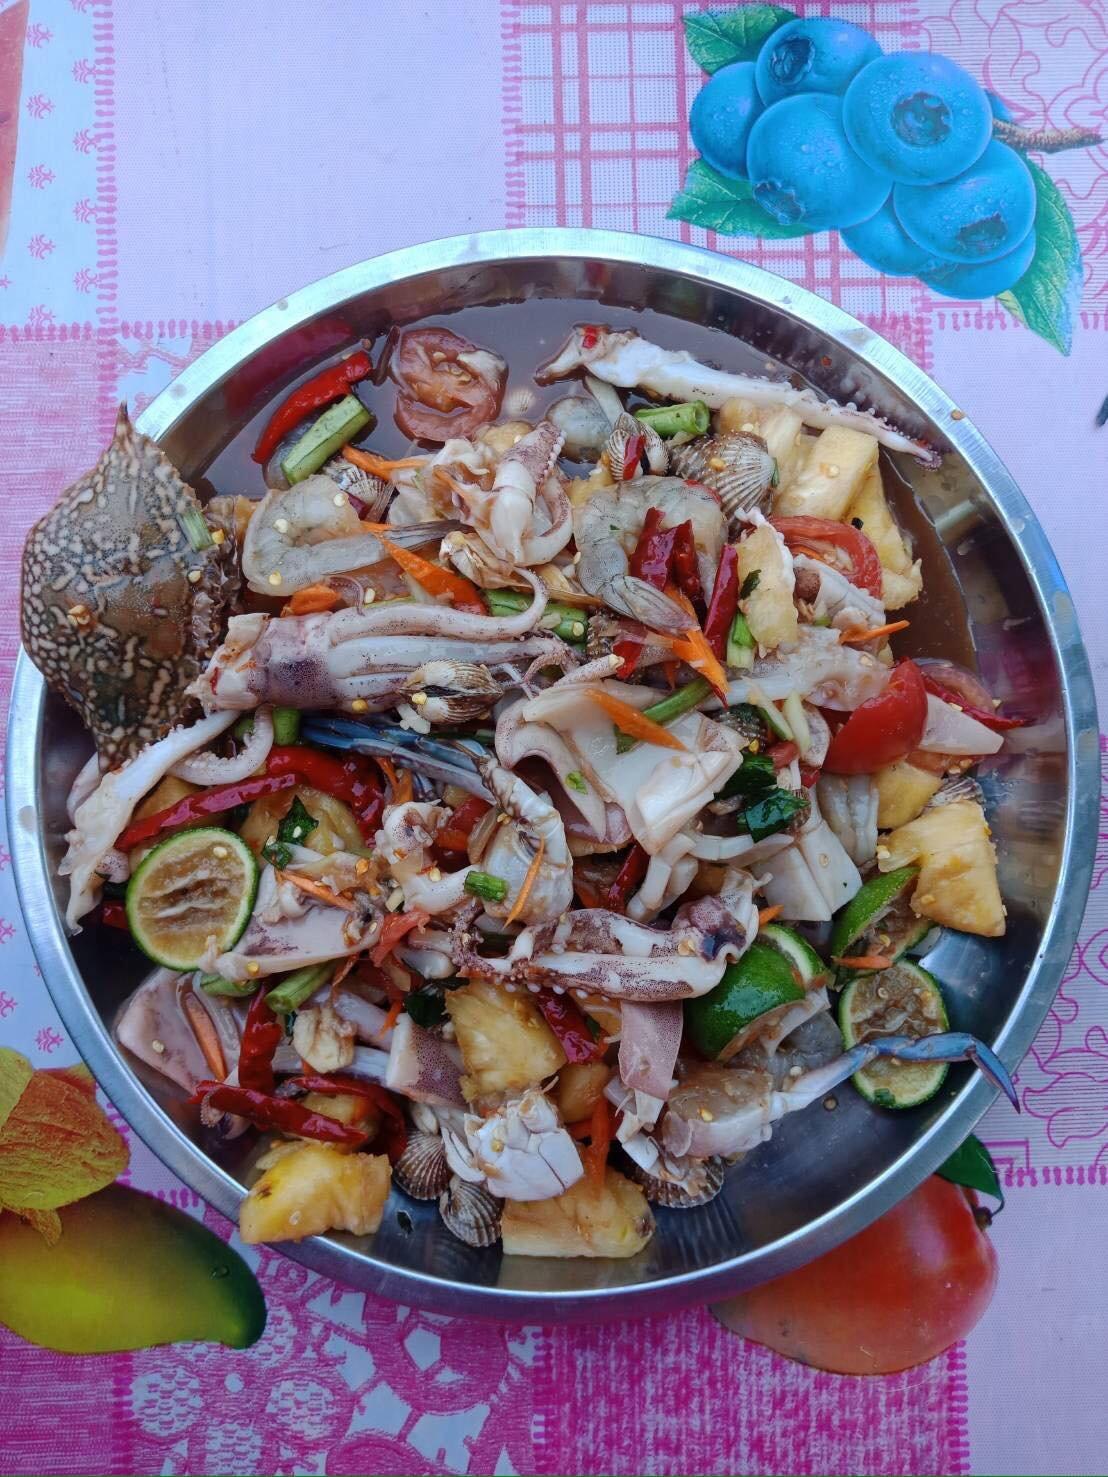 11 Bottles Nangfah Plara Fermented Pickled Fish Sauce Thai Food Papaya  Salad Dressing 400 g